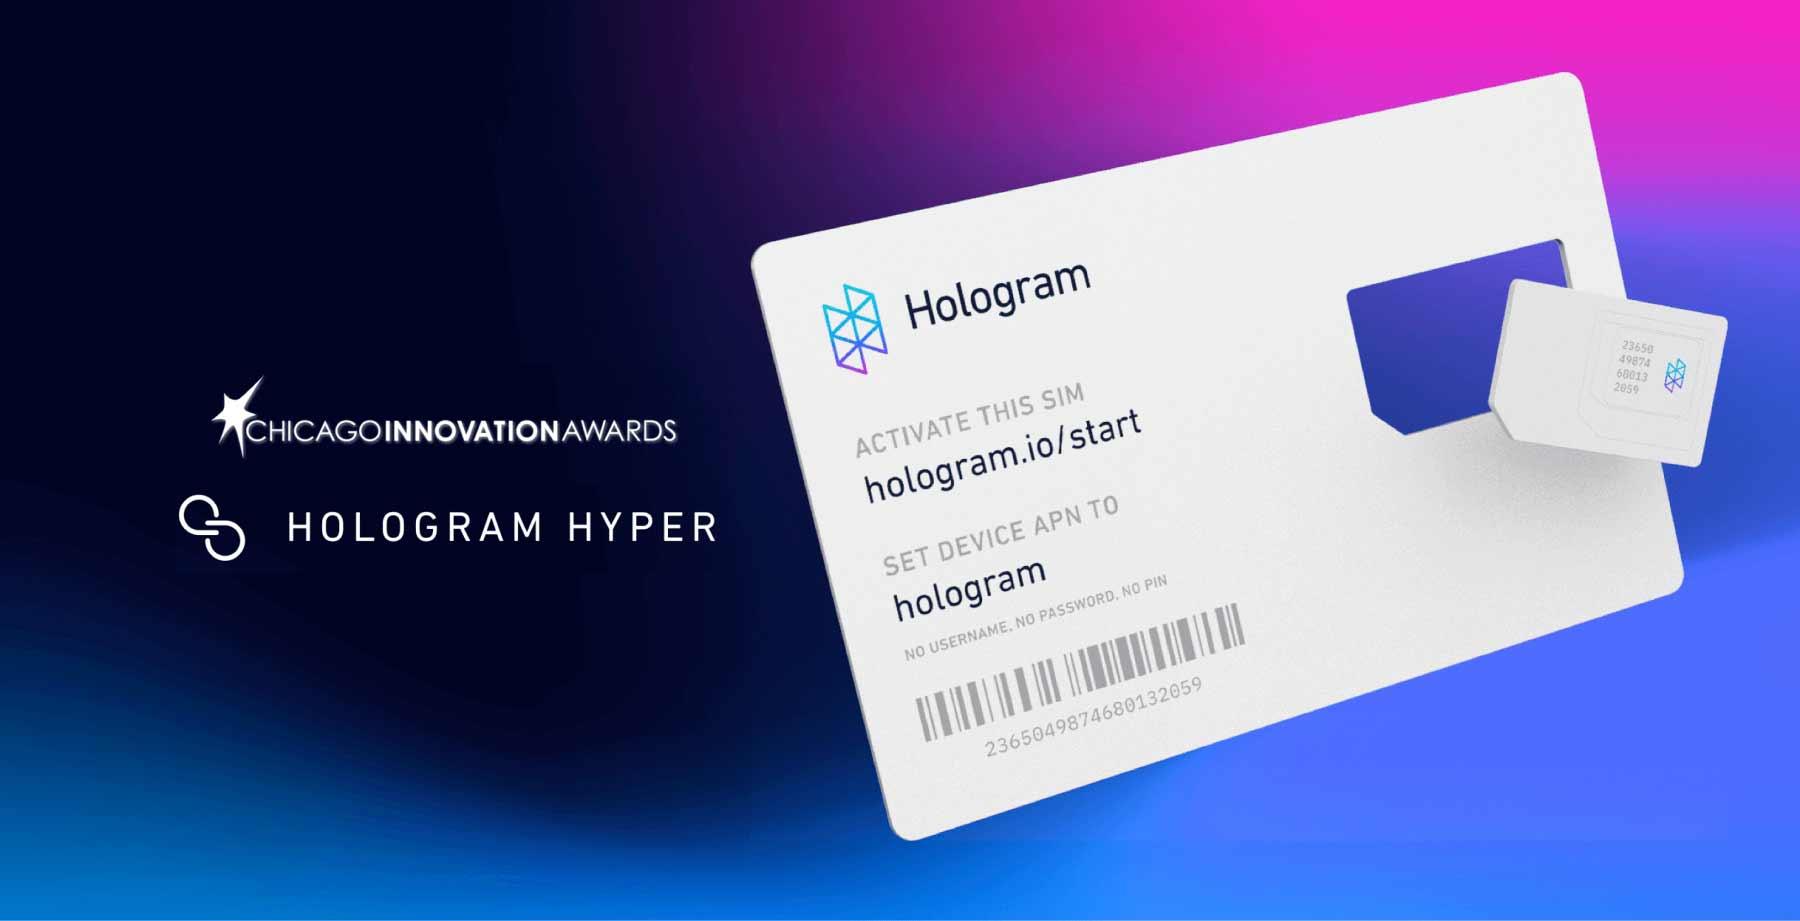 Hologram Hyper has won a Chicago Innovation Award.